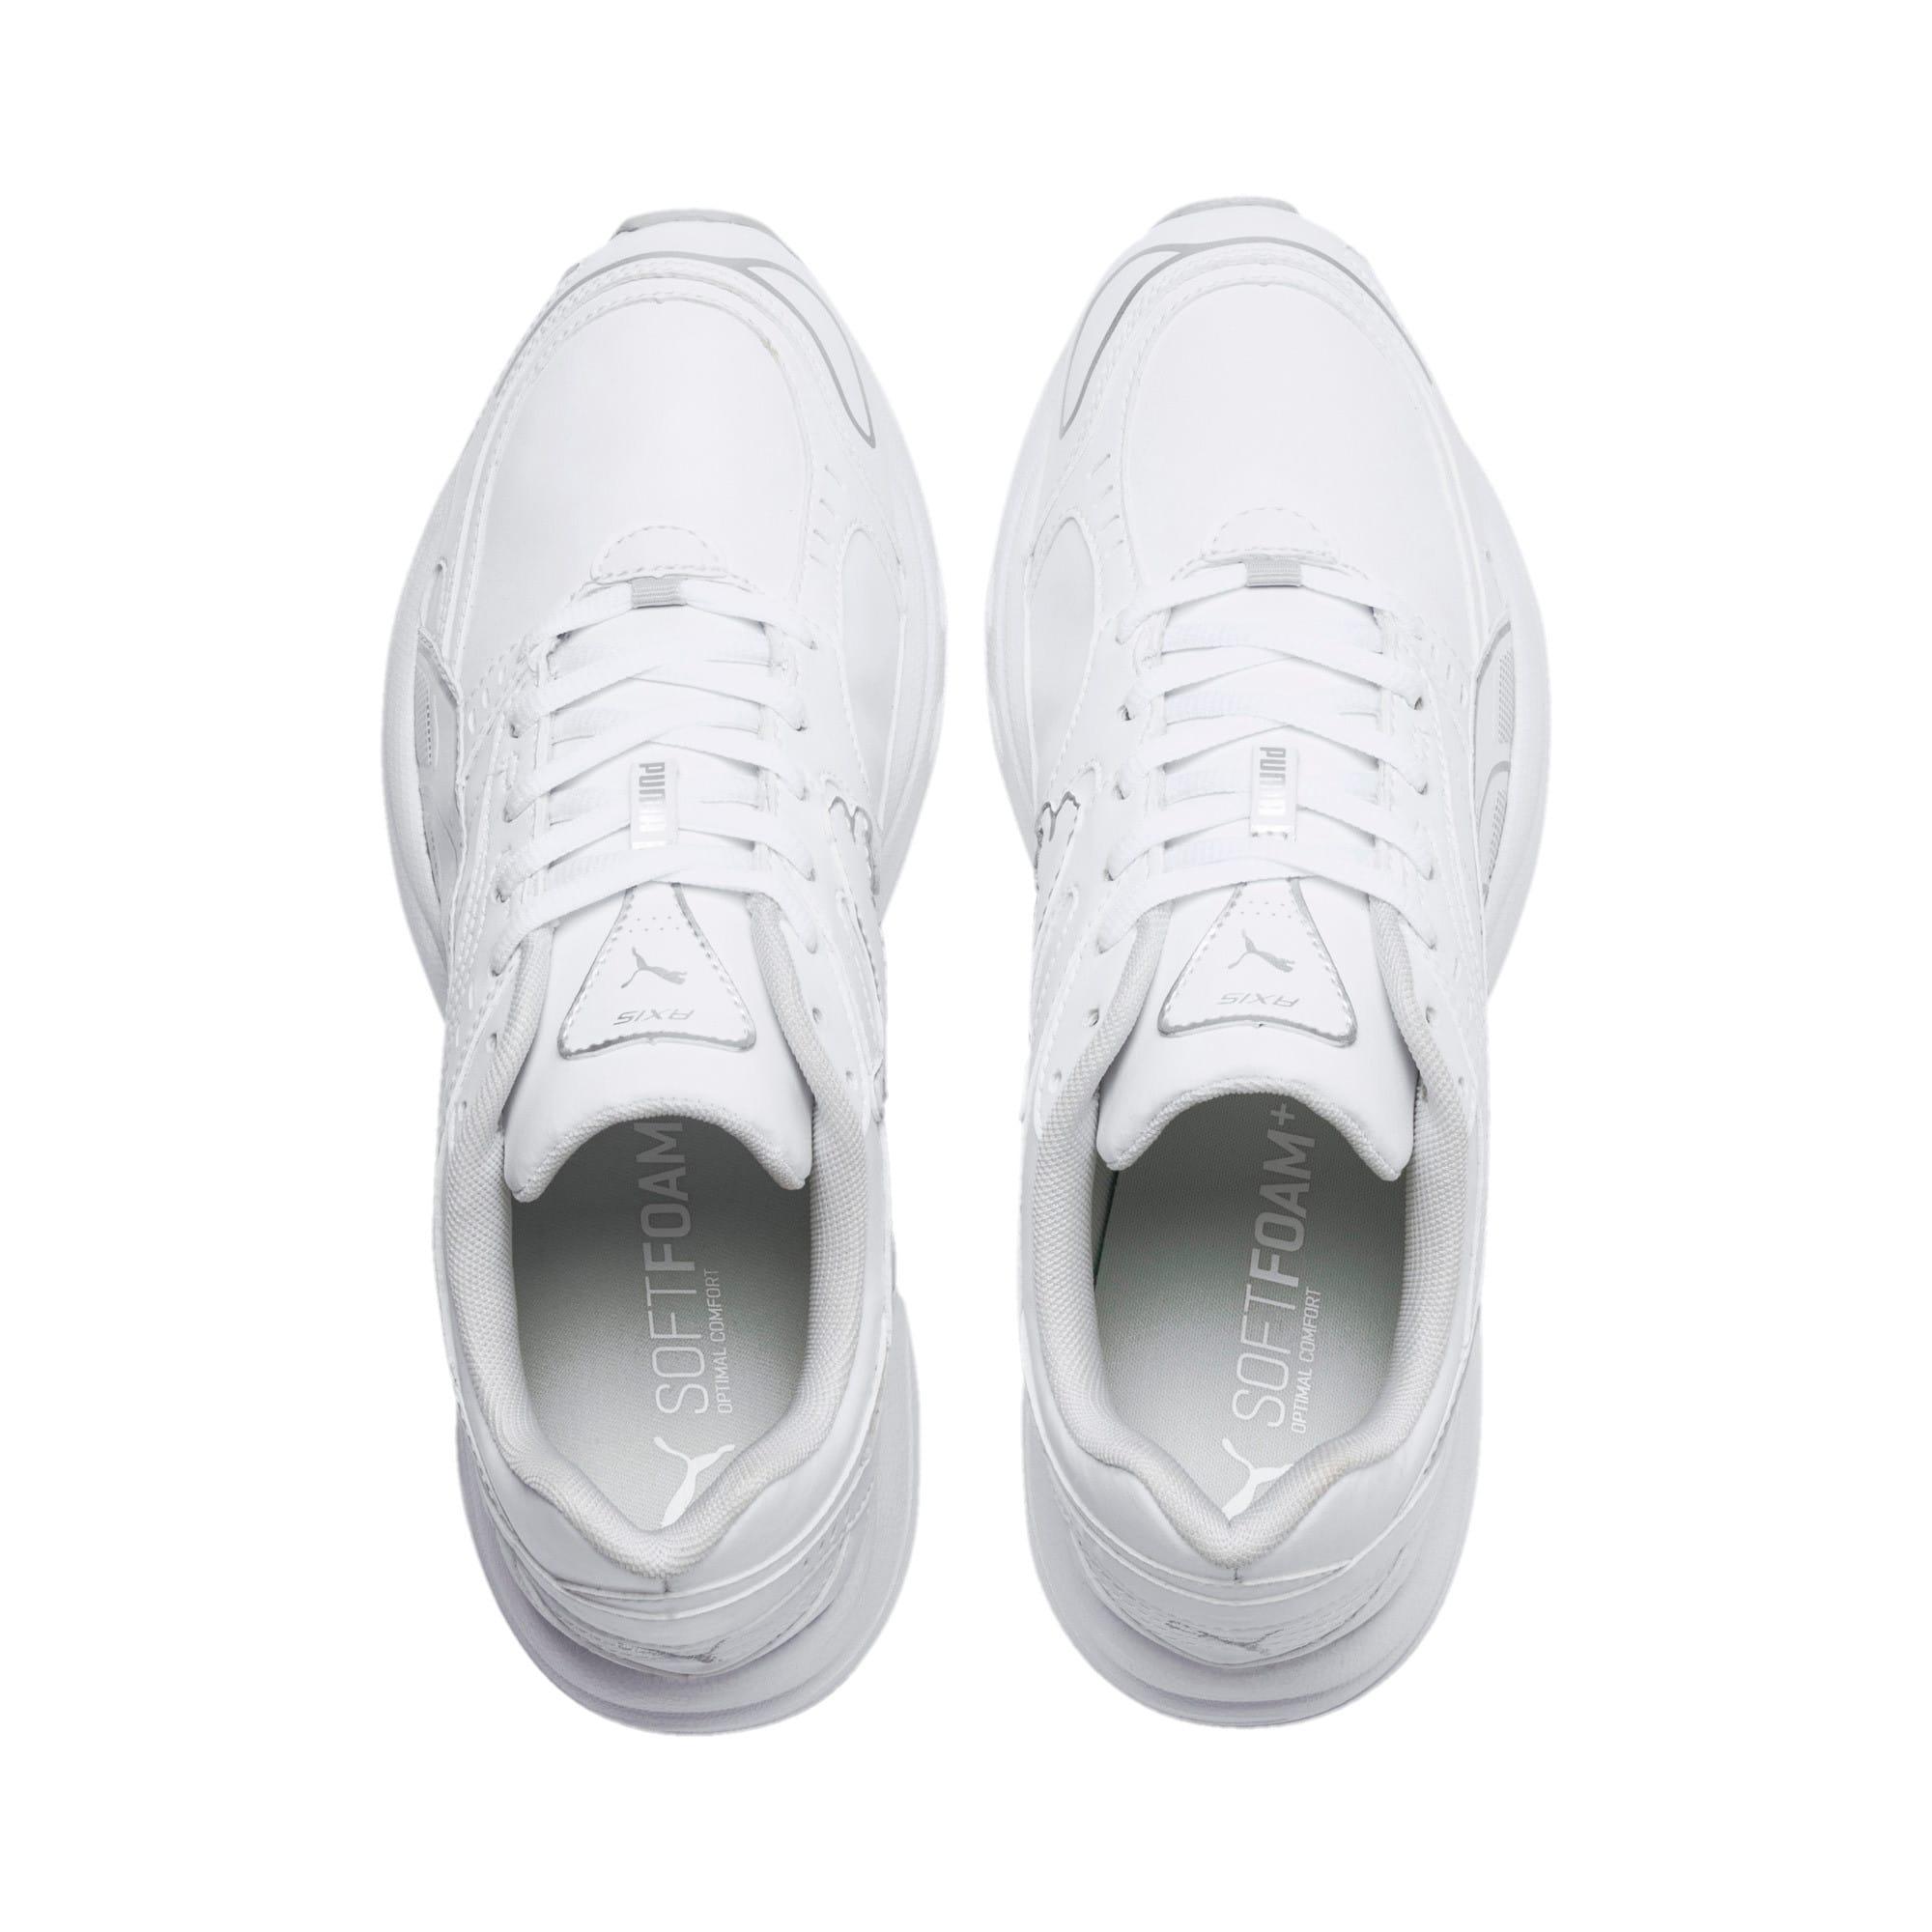 Thumbnail 6 of Axis SL Sneakers, Puma White-Glacier Gray, medium